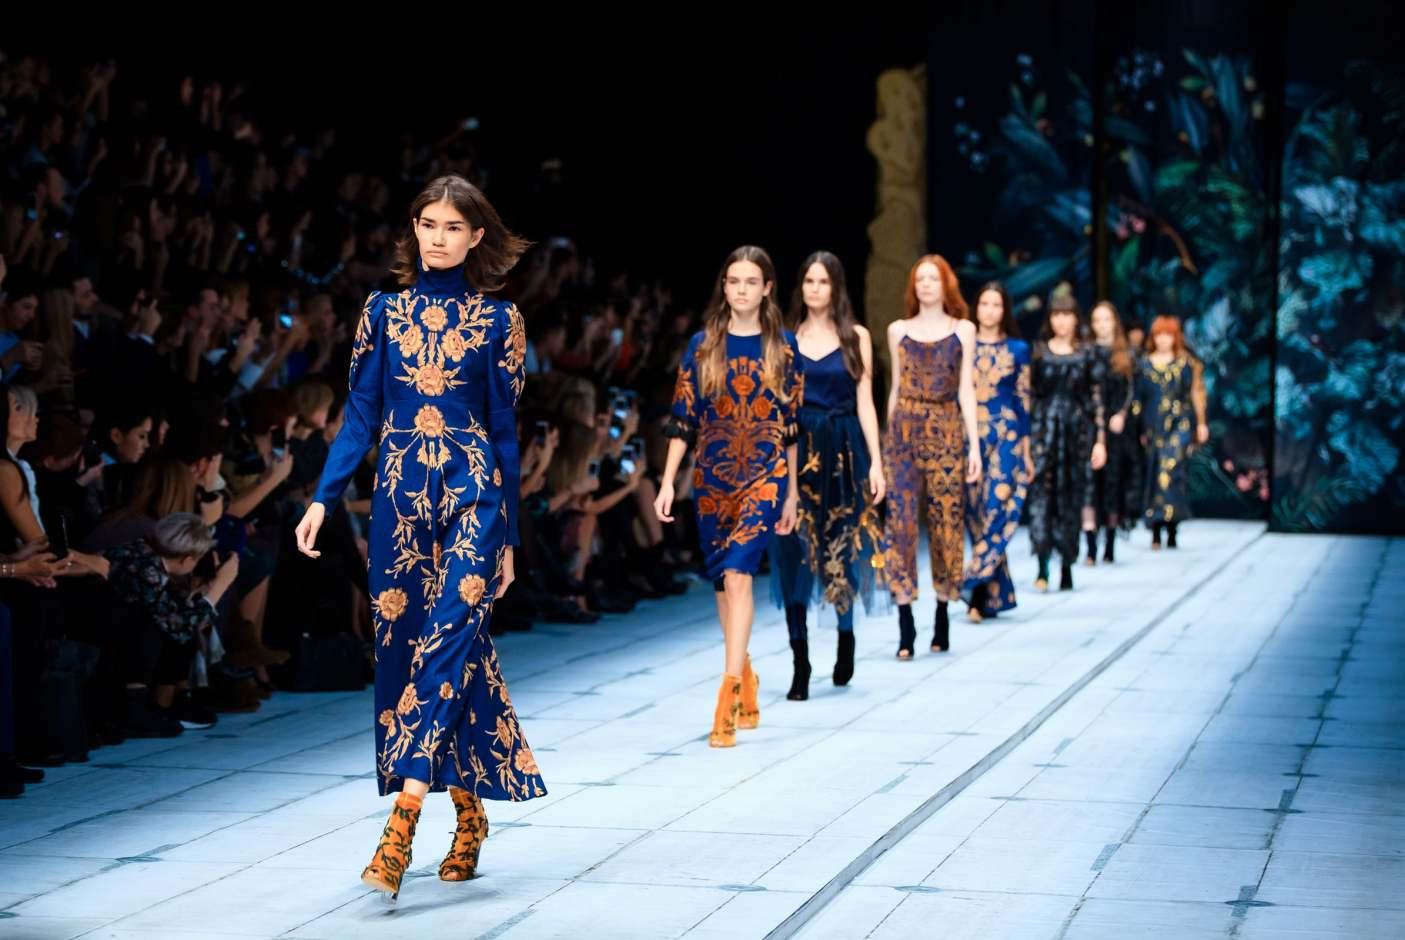 Ethical Designer Clothing Ethical Consumer